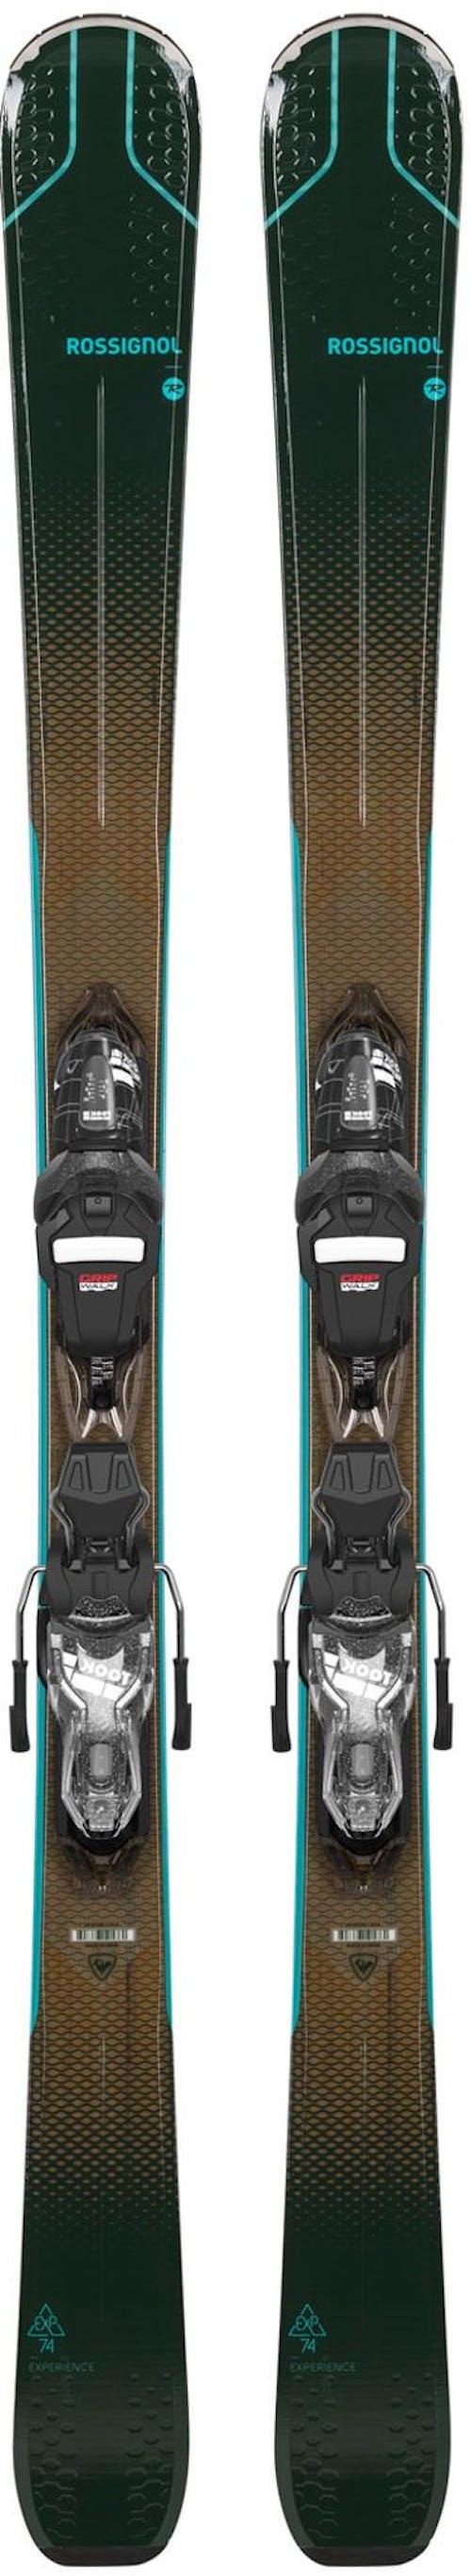 Rossignol Experience 74 Women's Skis + Xpress 10 Gw Bindings · 2021